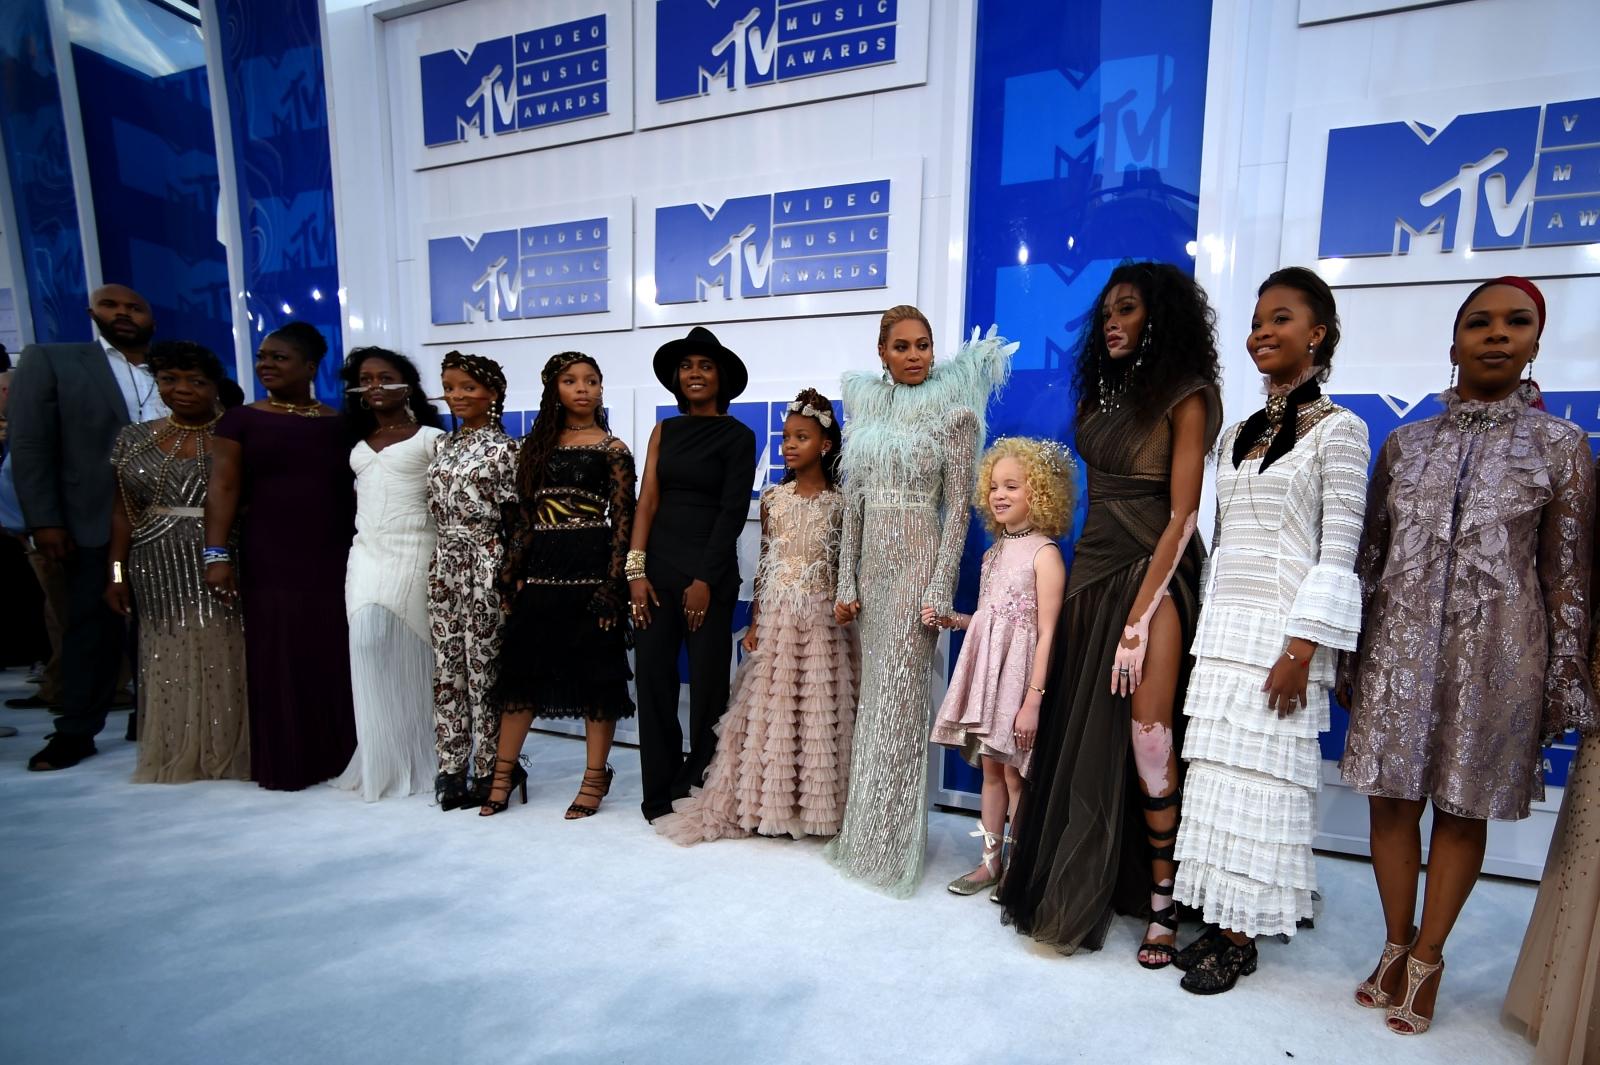 Rudy Giuliani: Beyoncé's Cop-Critical VMA Performance a 'Shame'